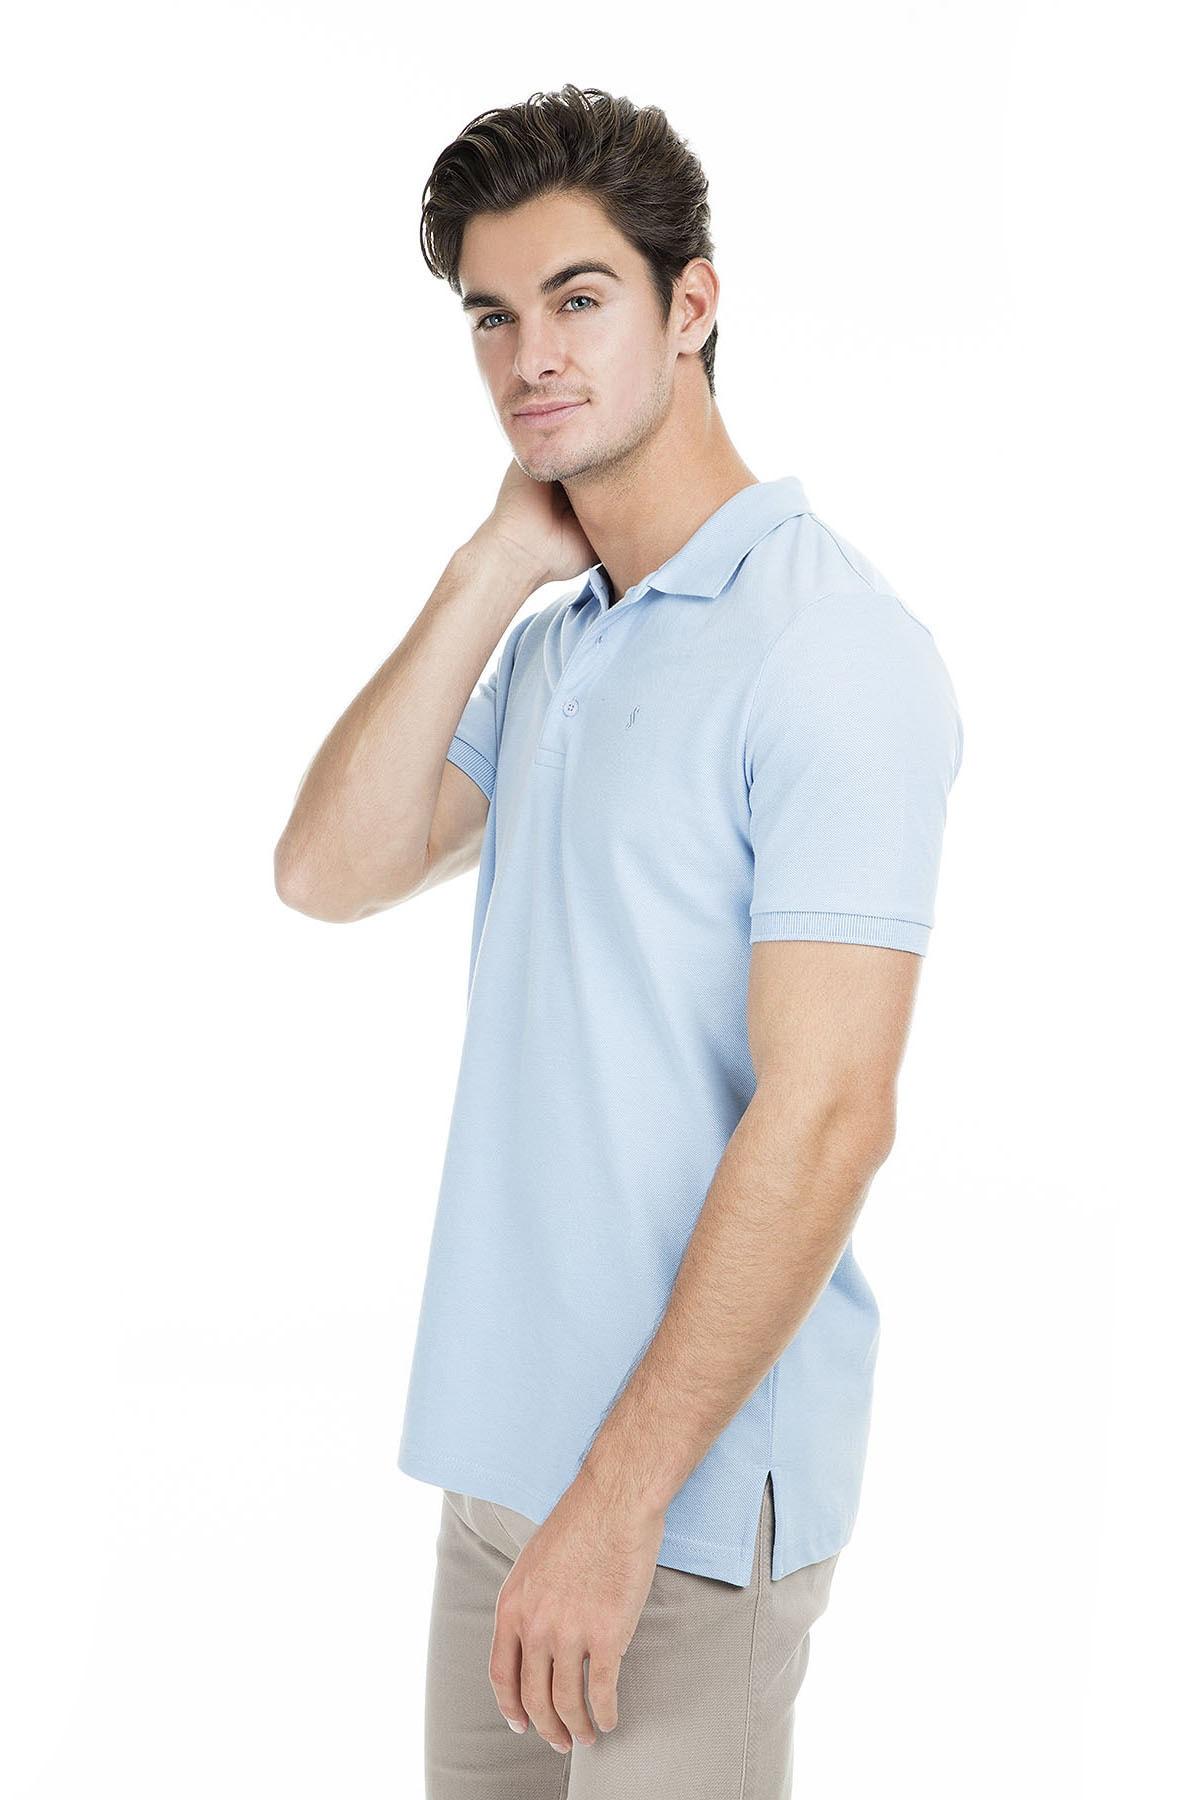 Sabri Özel Erkek Açık Mavi Polo Yaka T-Shirt - T446688 3